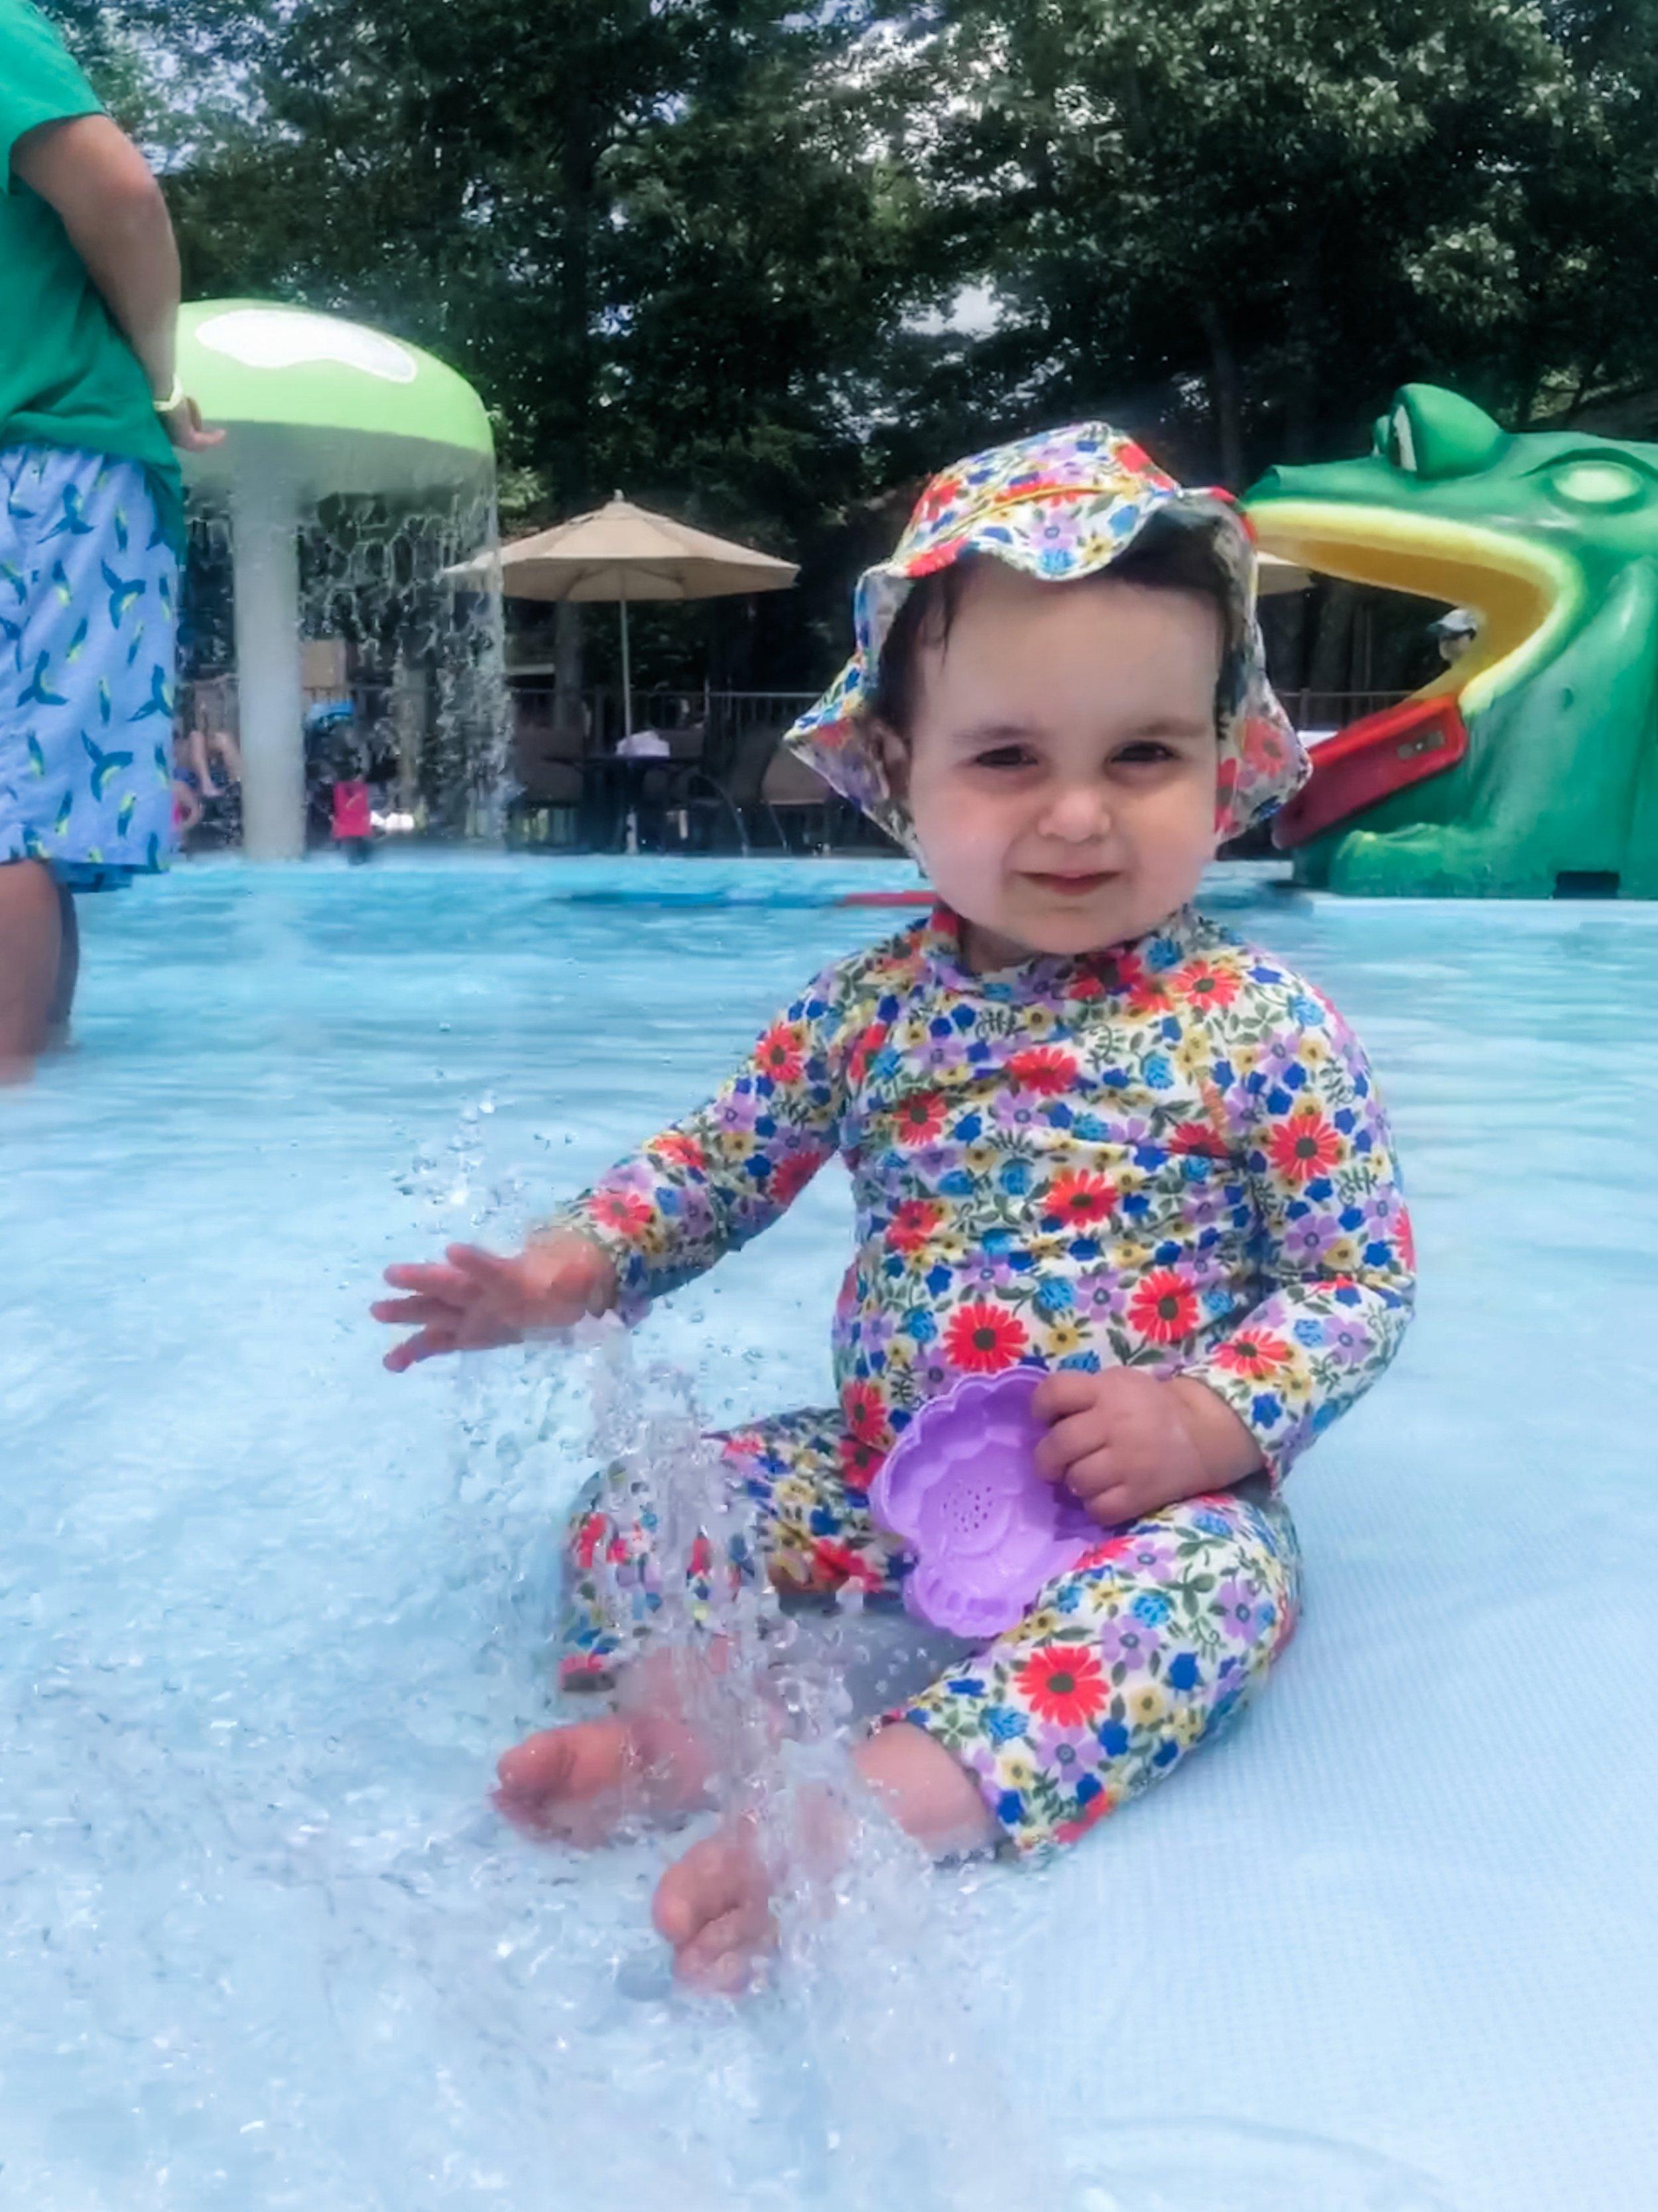 Miriam Cohen Woodloch family  travel  (pool 2).jpg